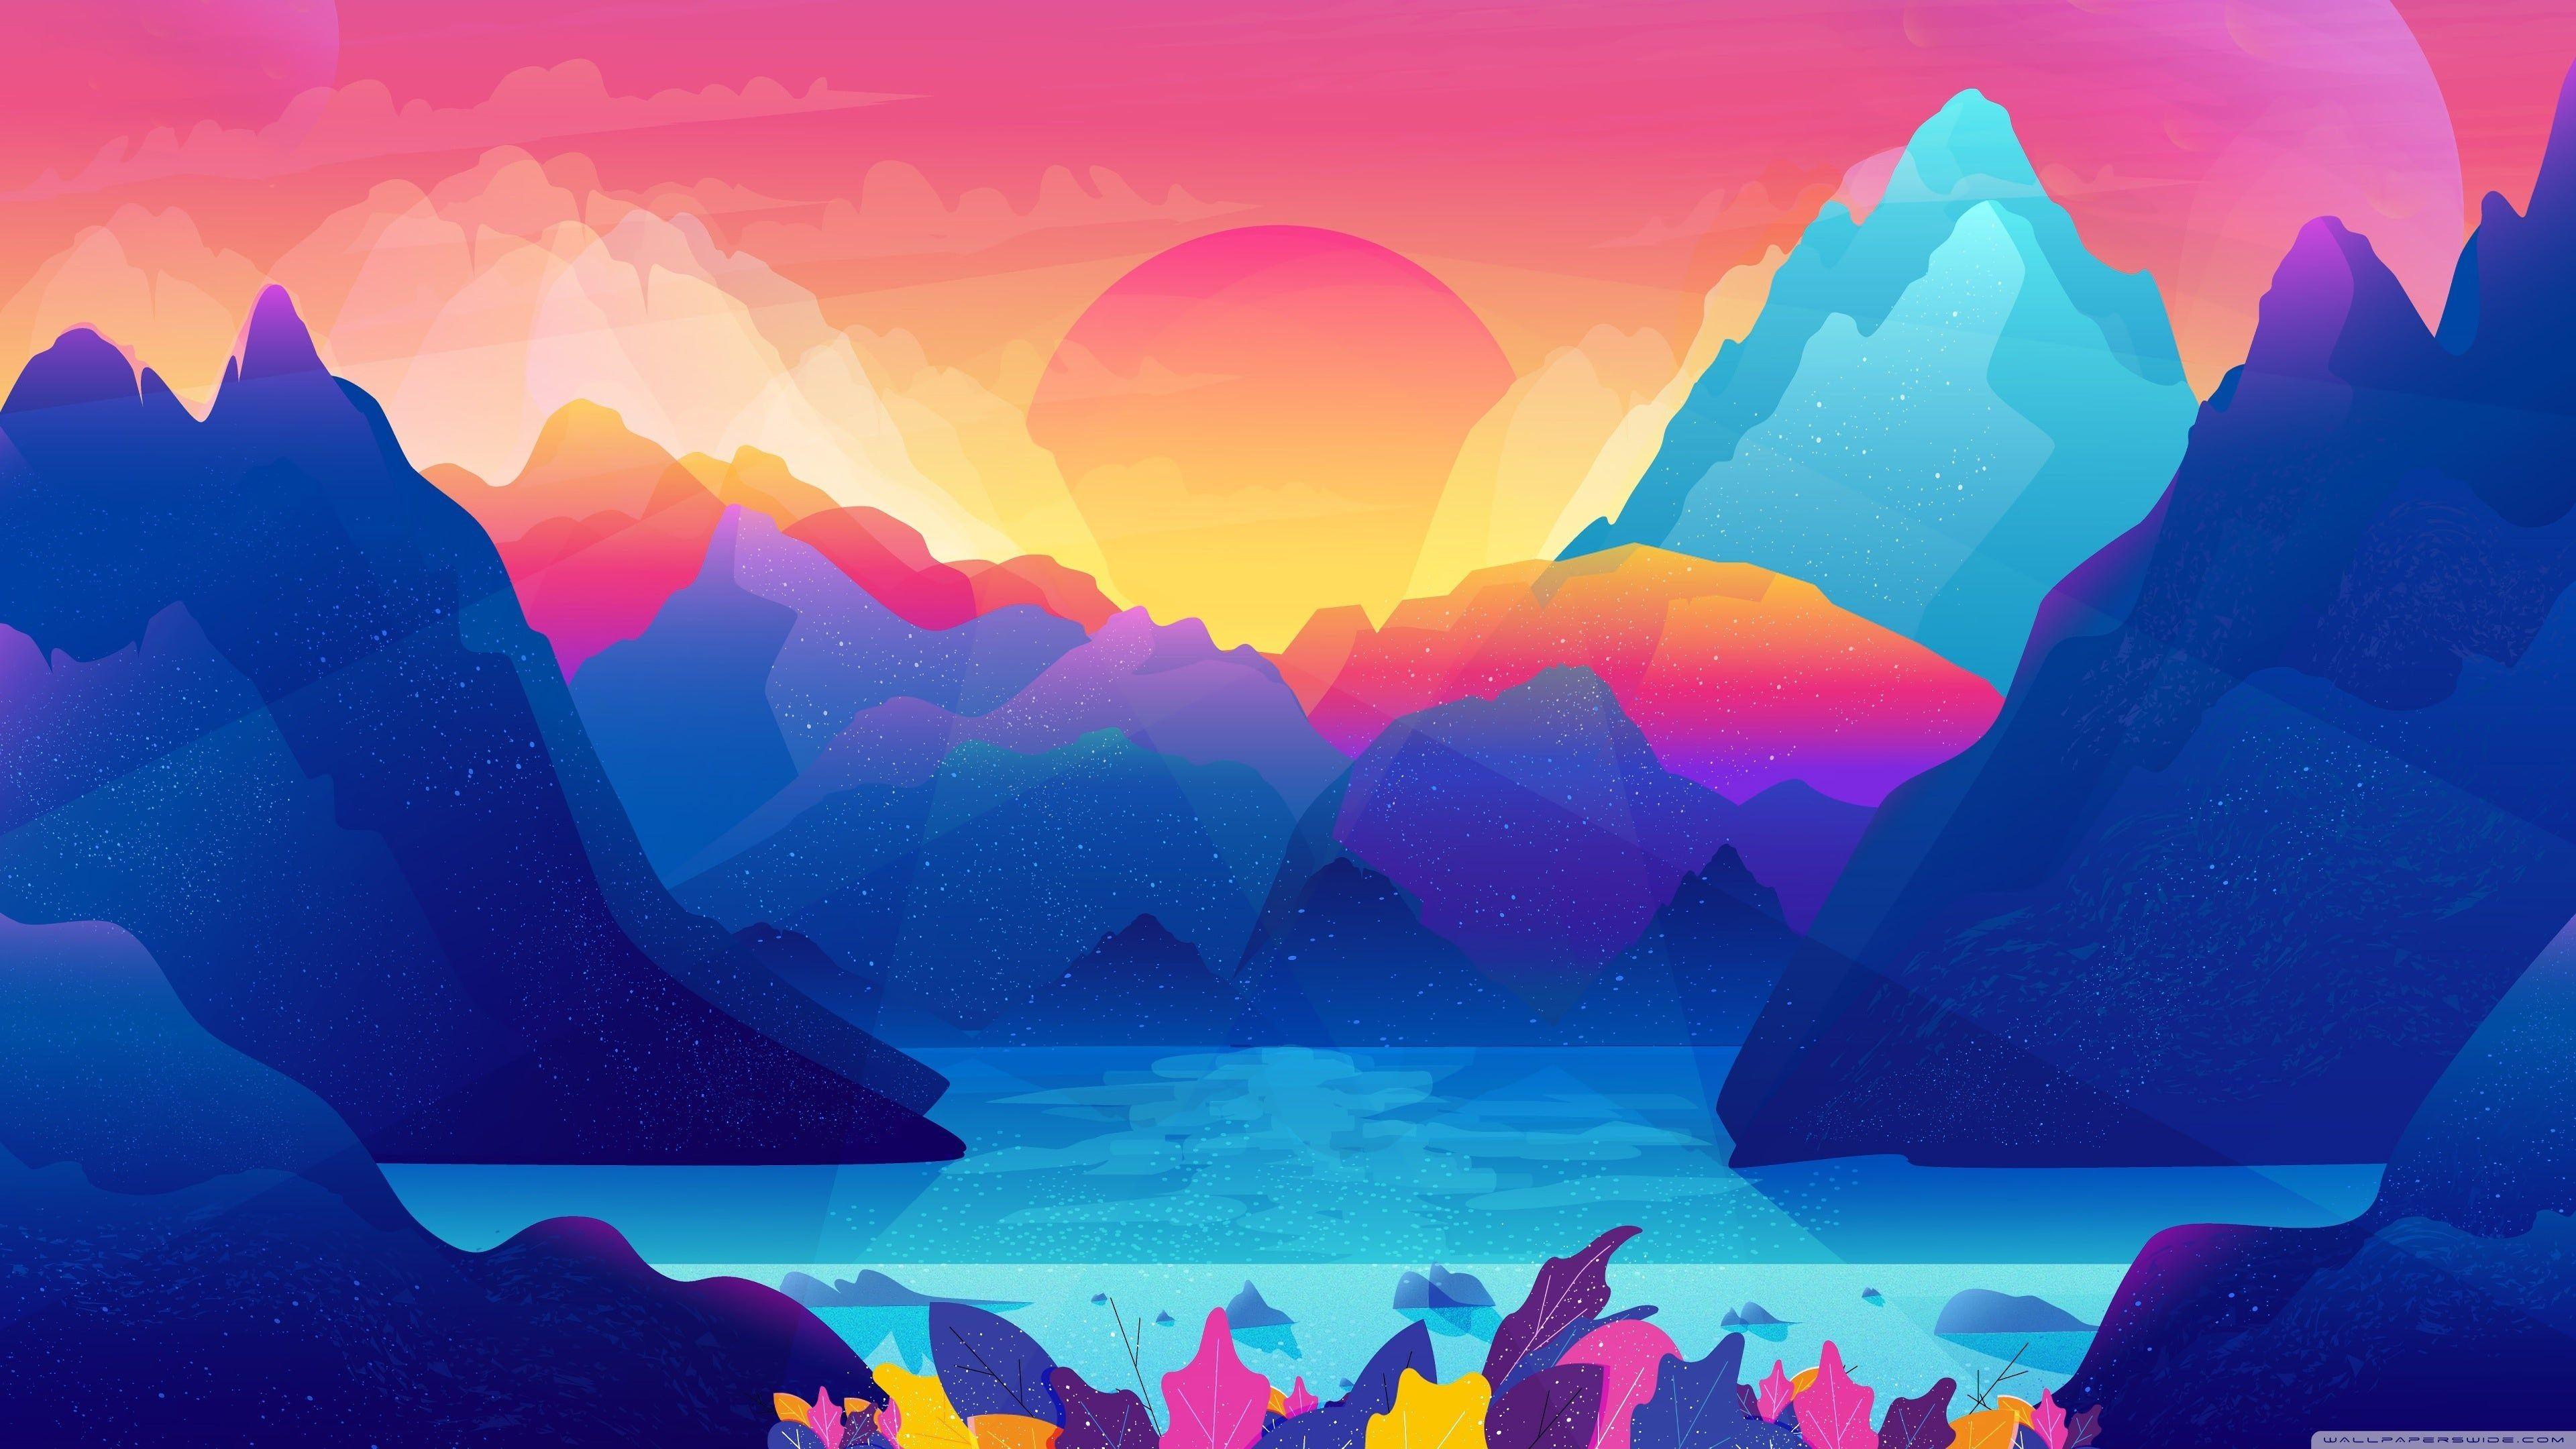 Animated Colorful Landscape 4k Wallpaper In 2020 Art Wallpaper Colorful Landscape Landscape Illustration